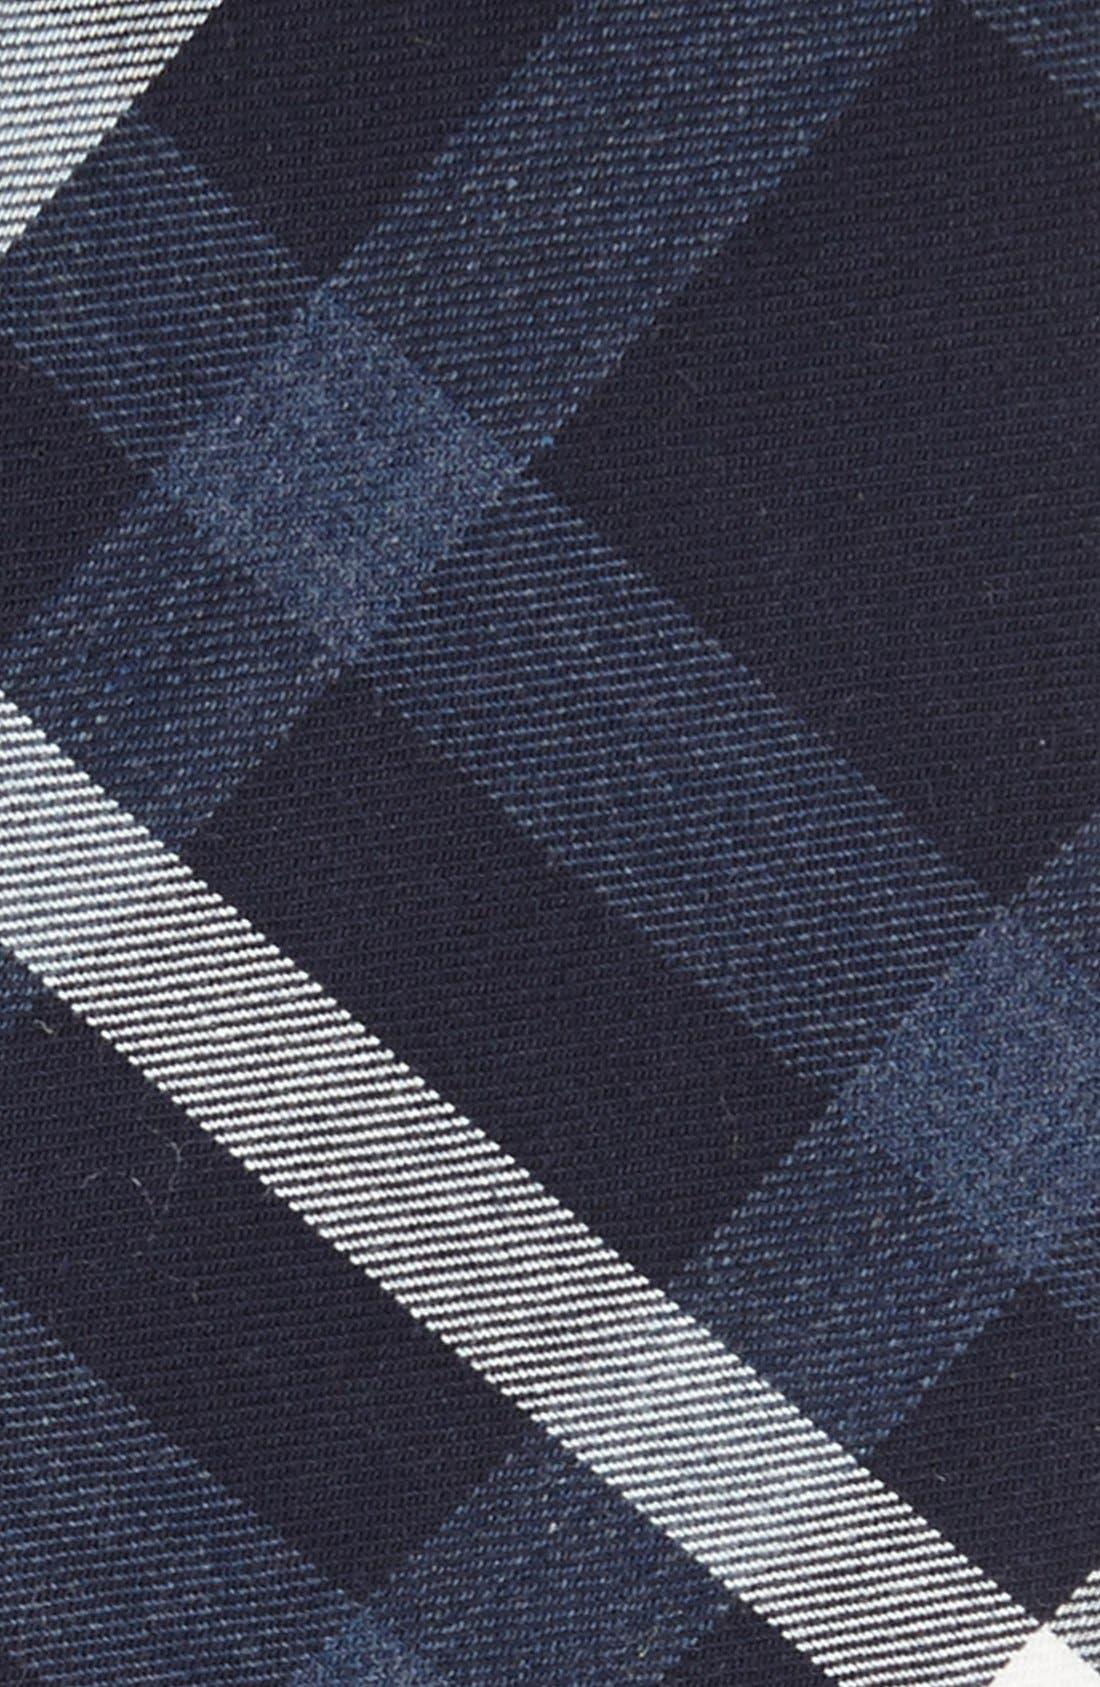 Alternate Image 2  - Gitman Woven Cotton Tie